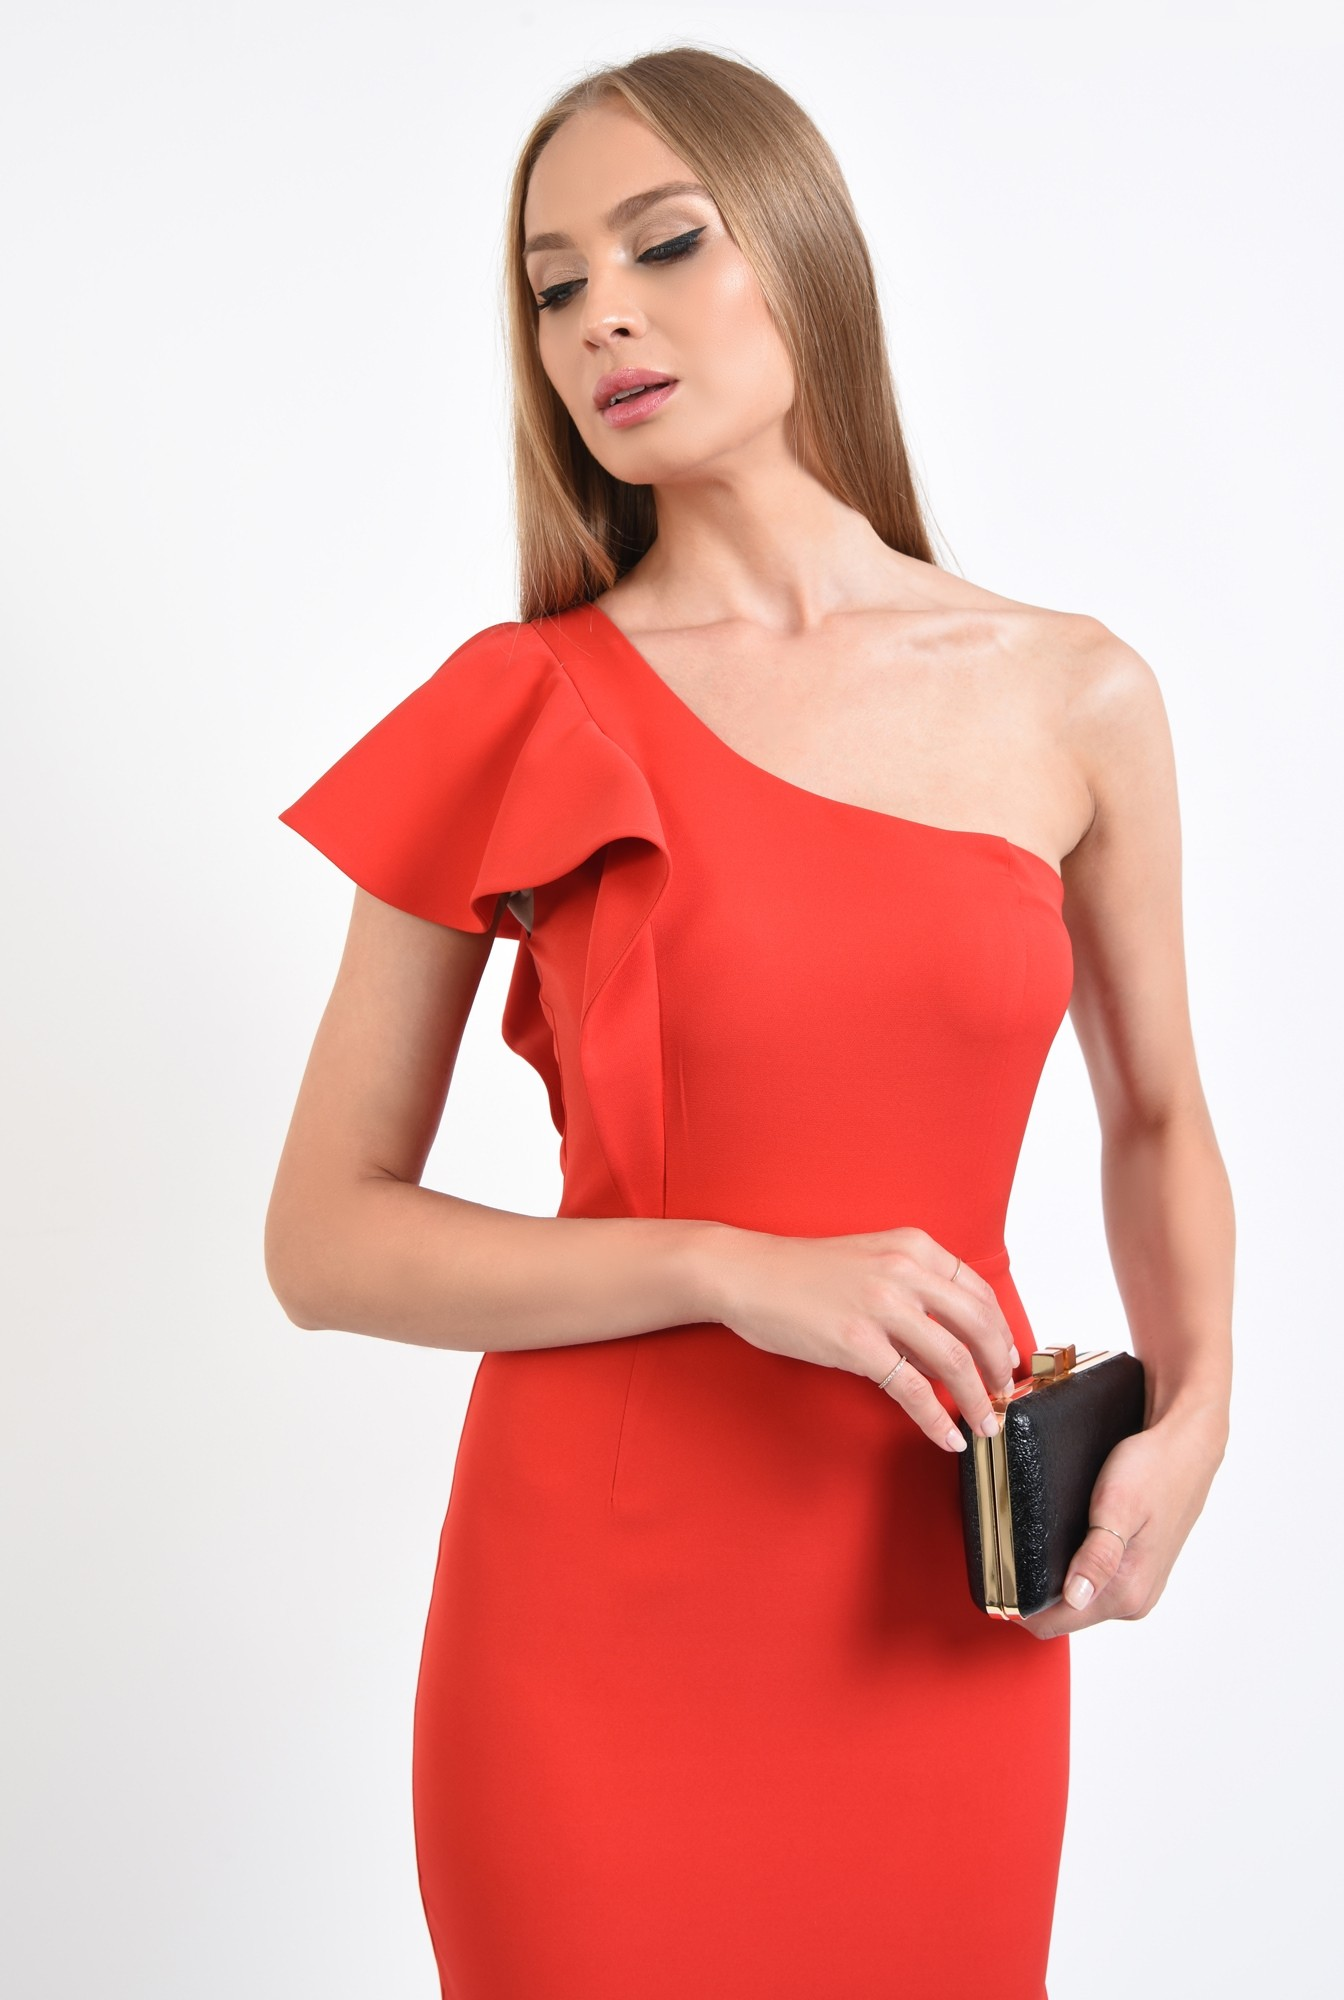 2 - rochie de ocazie, cambrata, slit la spate, rochii online